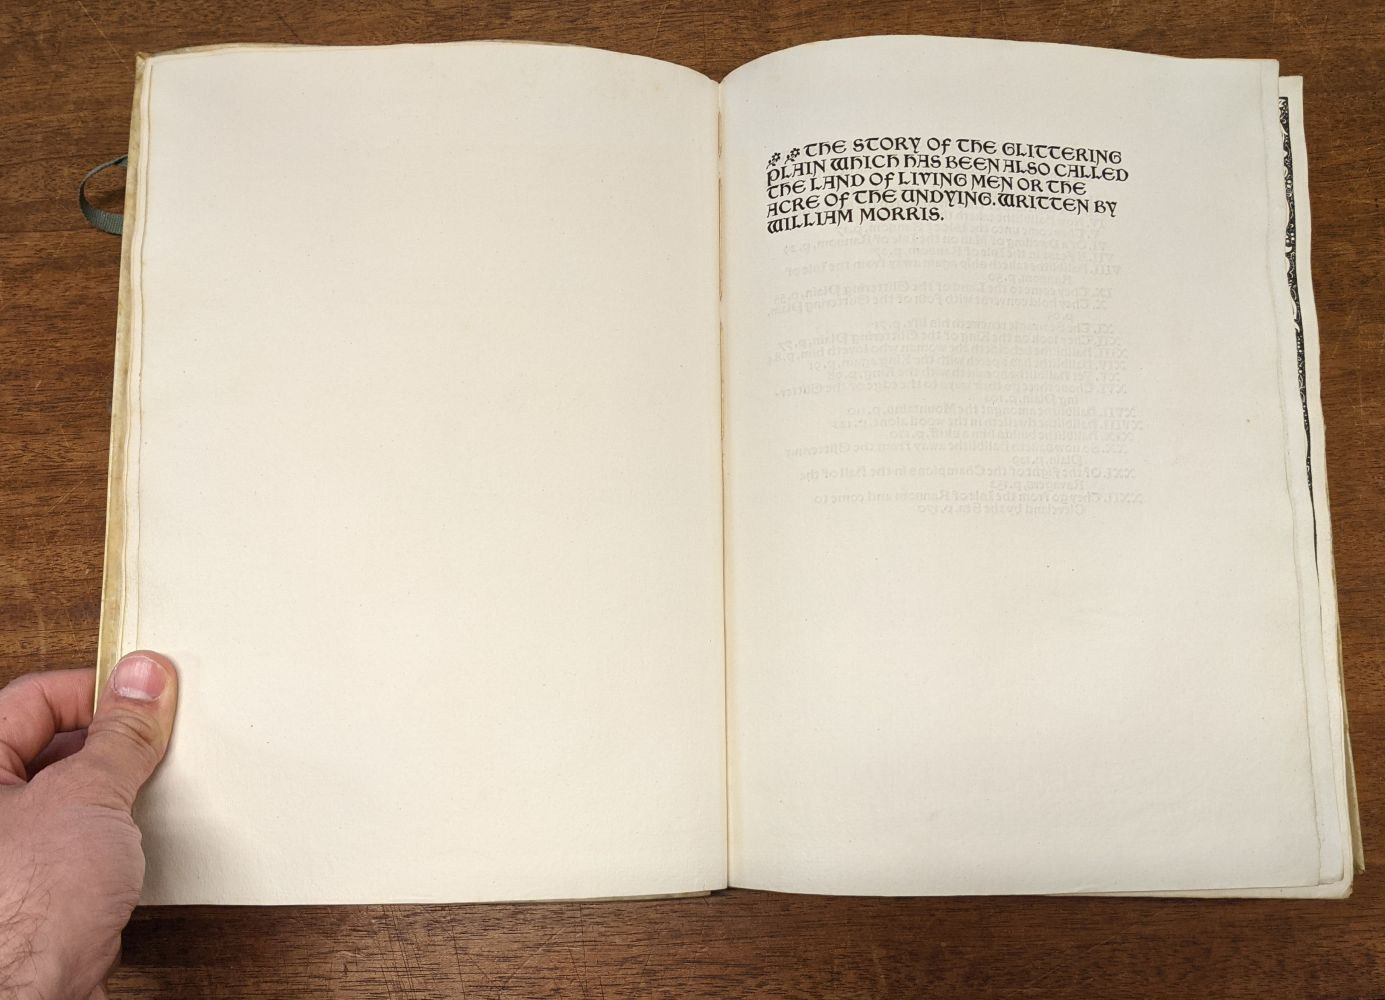 Kelmscott Press. The Story of the Glittering Plain, 1894 - Image 6 of 10